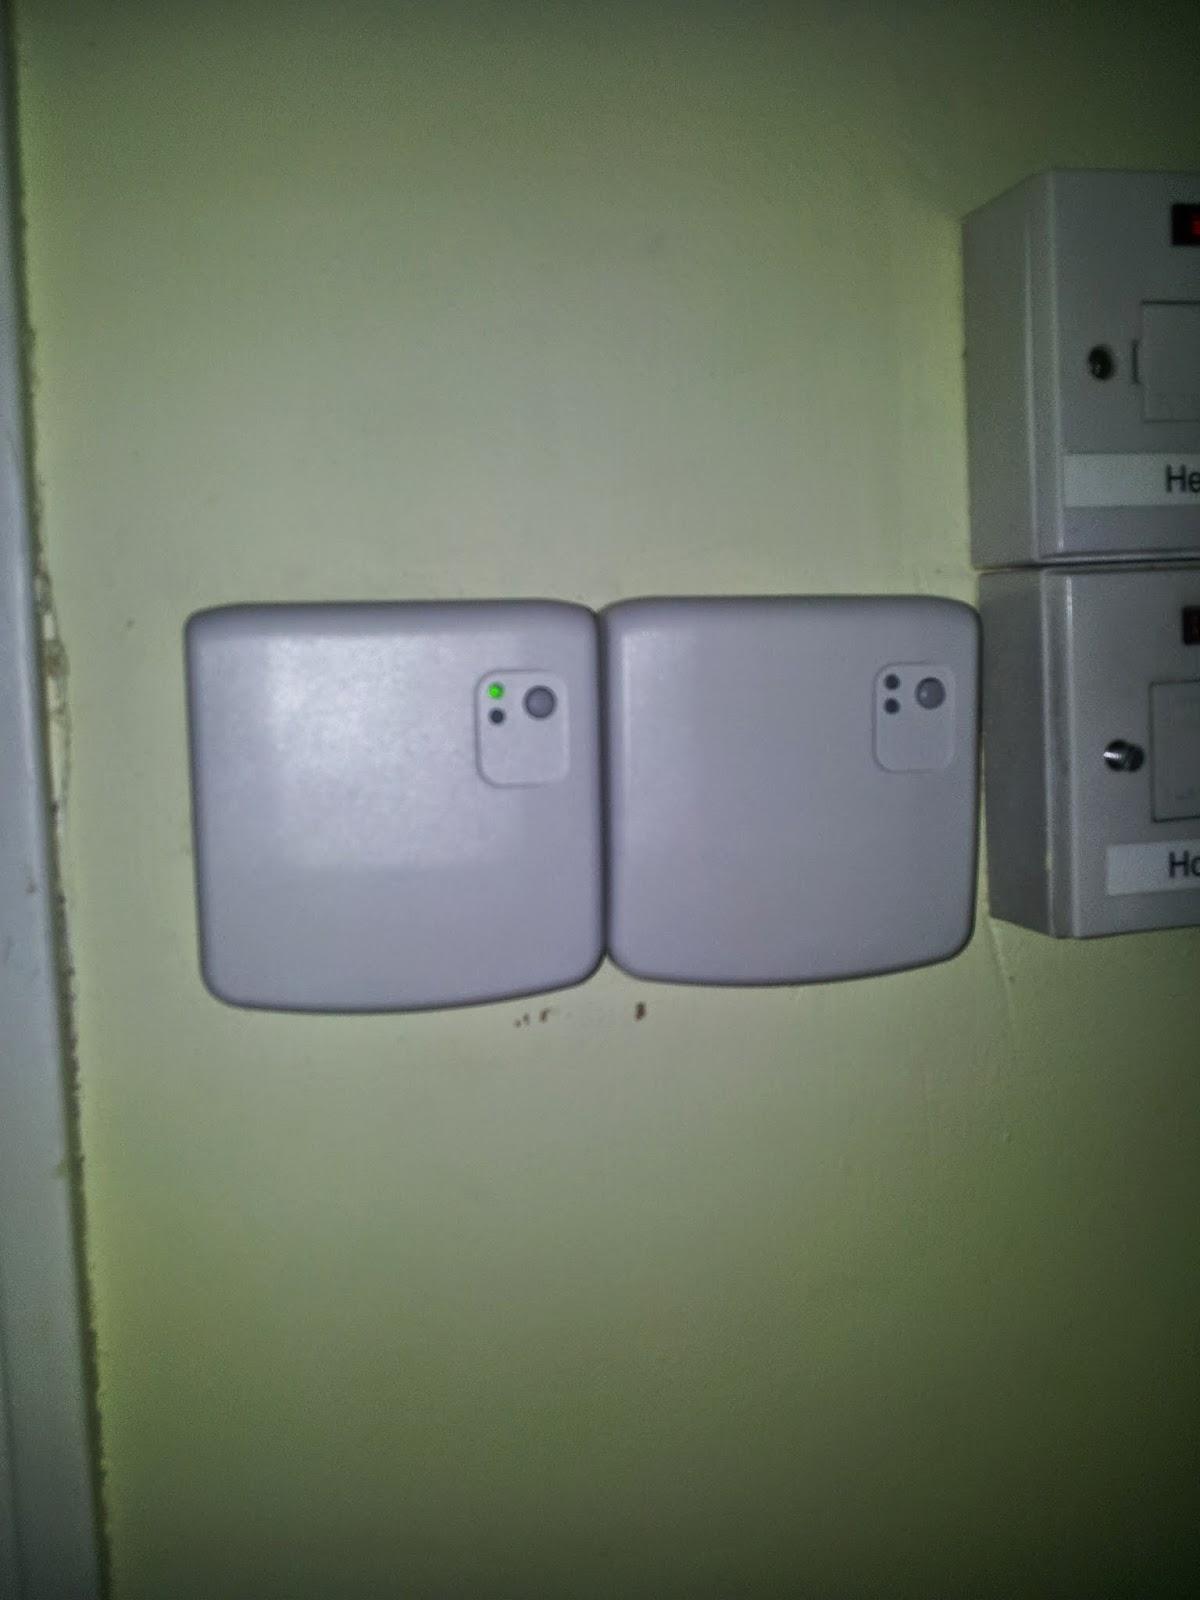 Honeywell Mercury Thermostat Wiring Diagram Pro Auto Rth7600d